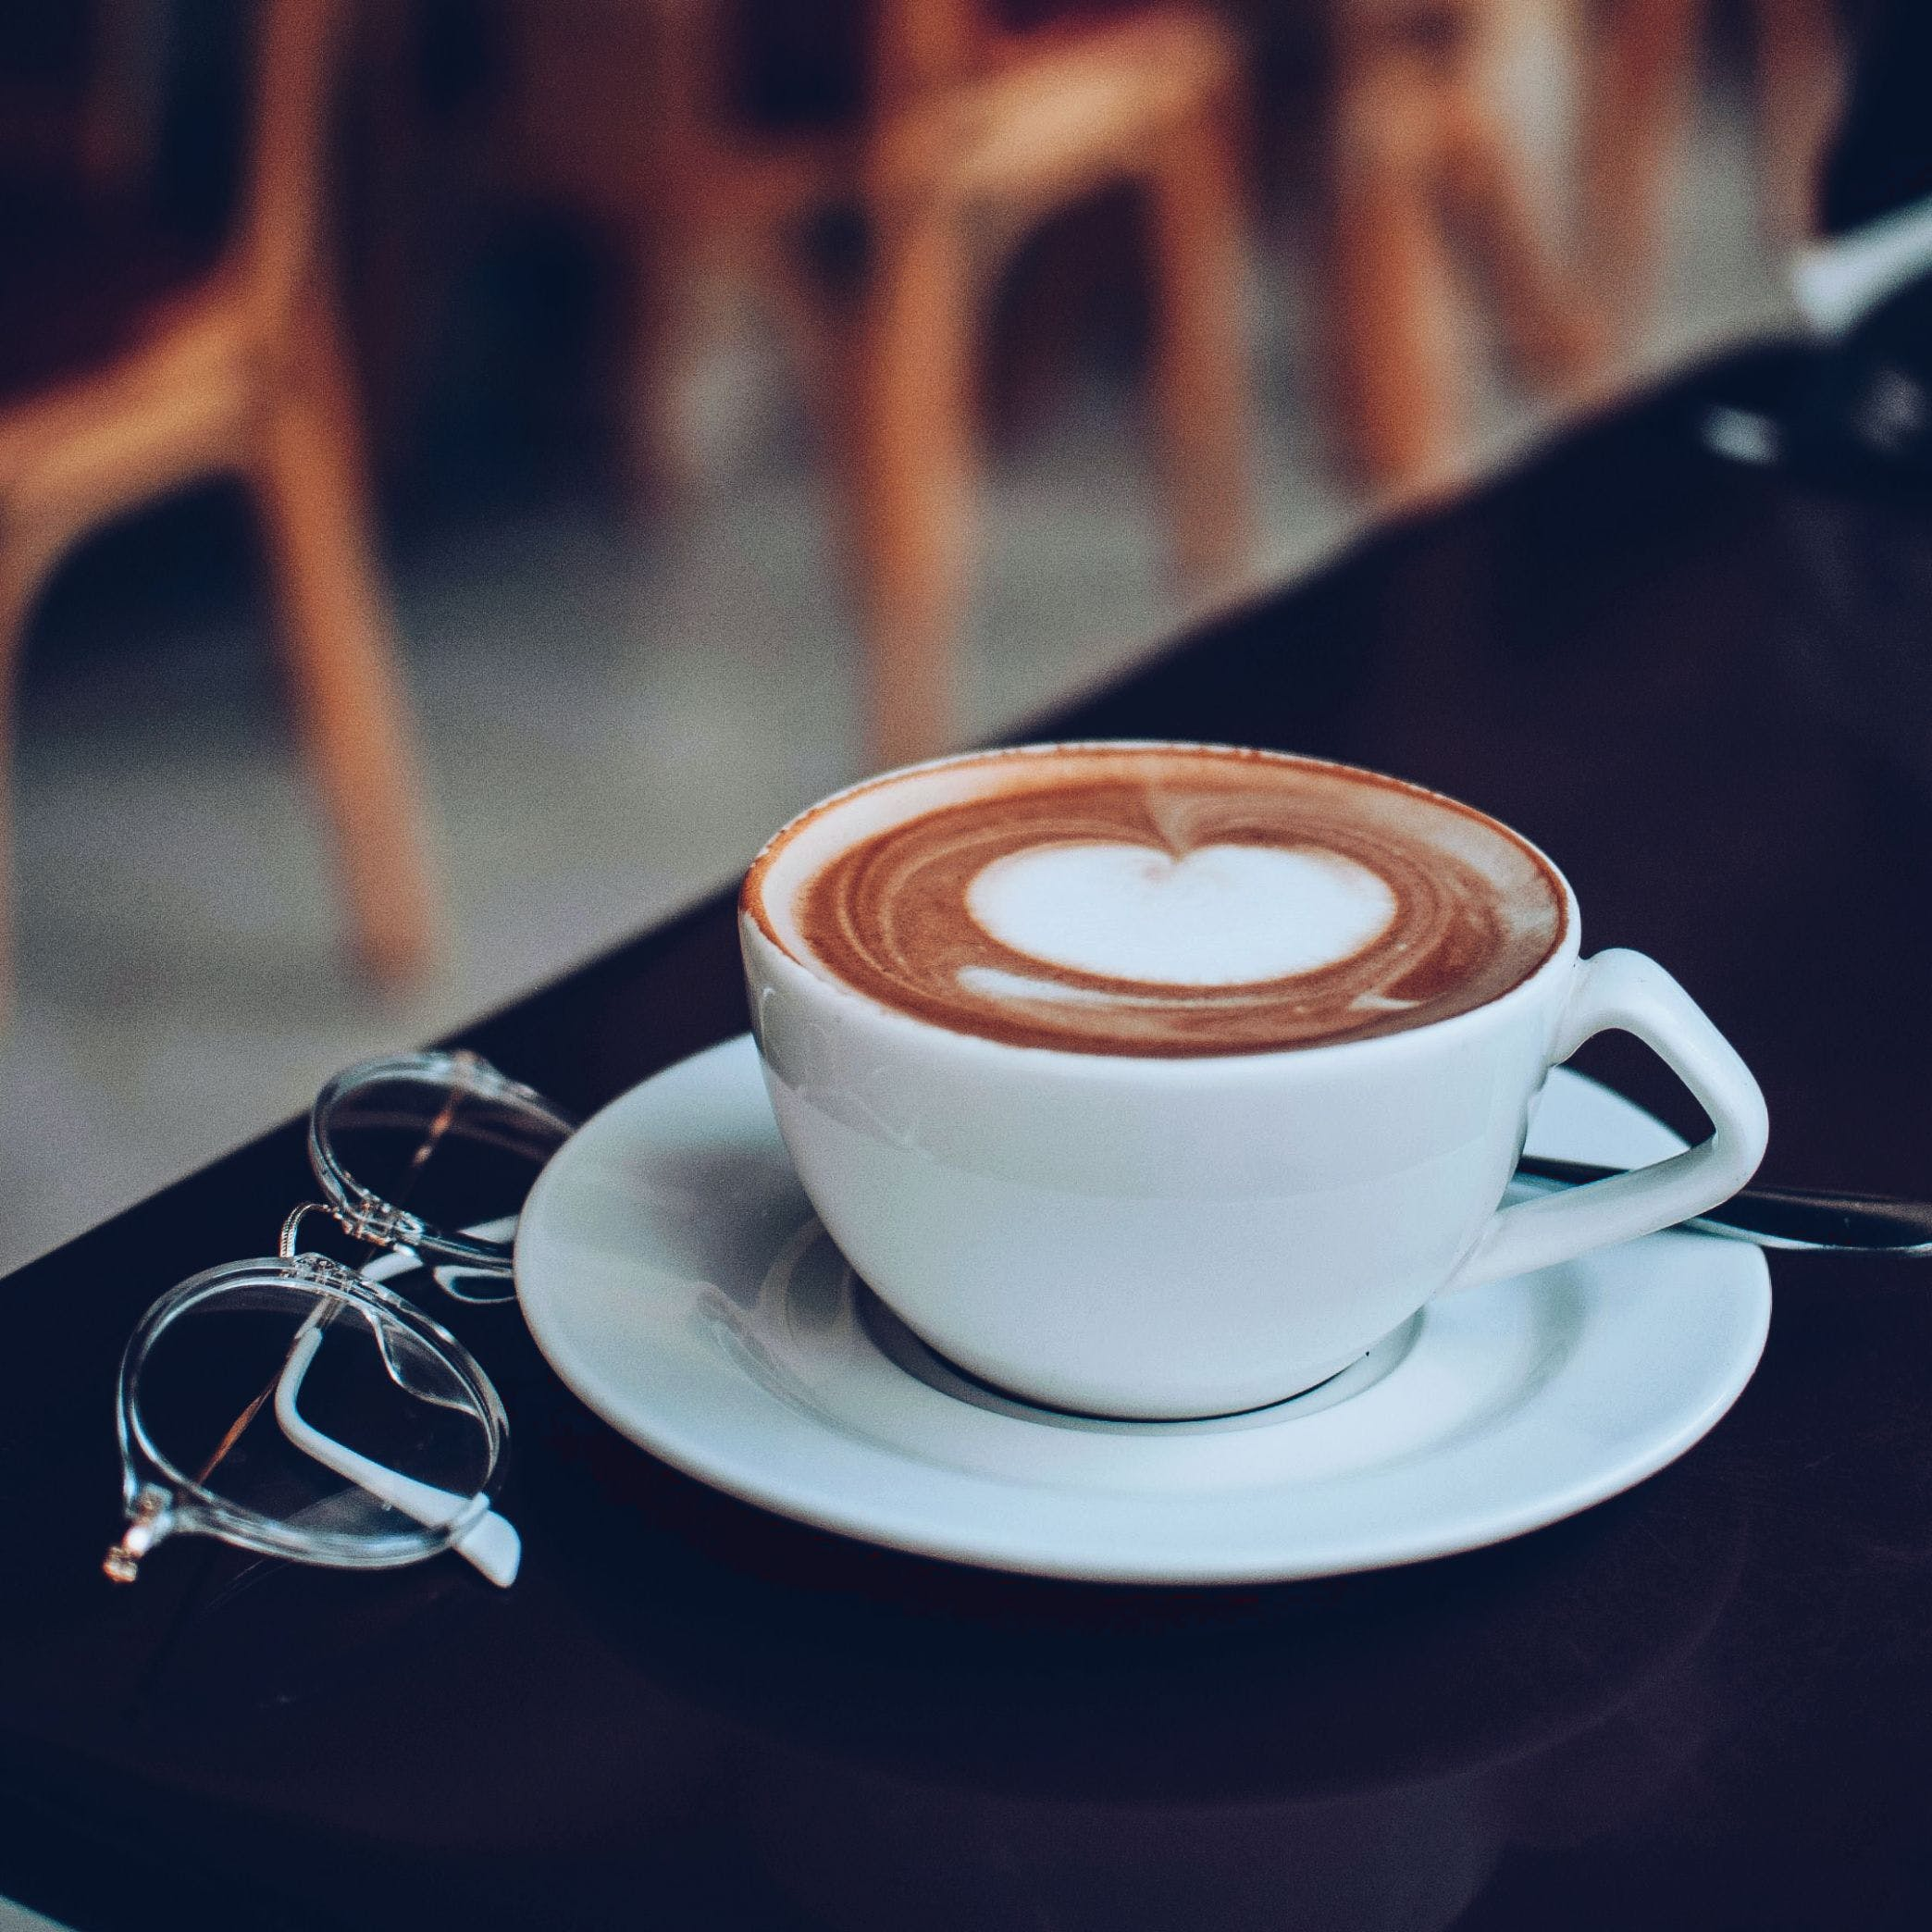 Gratis lagerfoto af cappuccino, delikat, Drik, drink